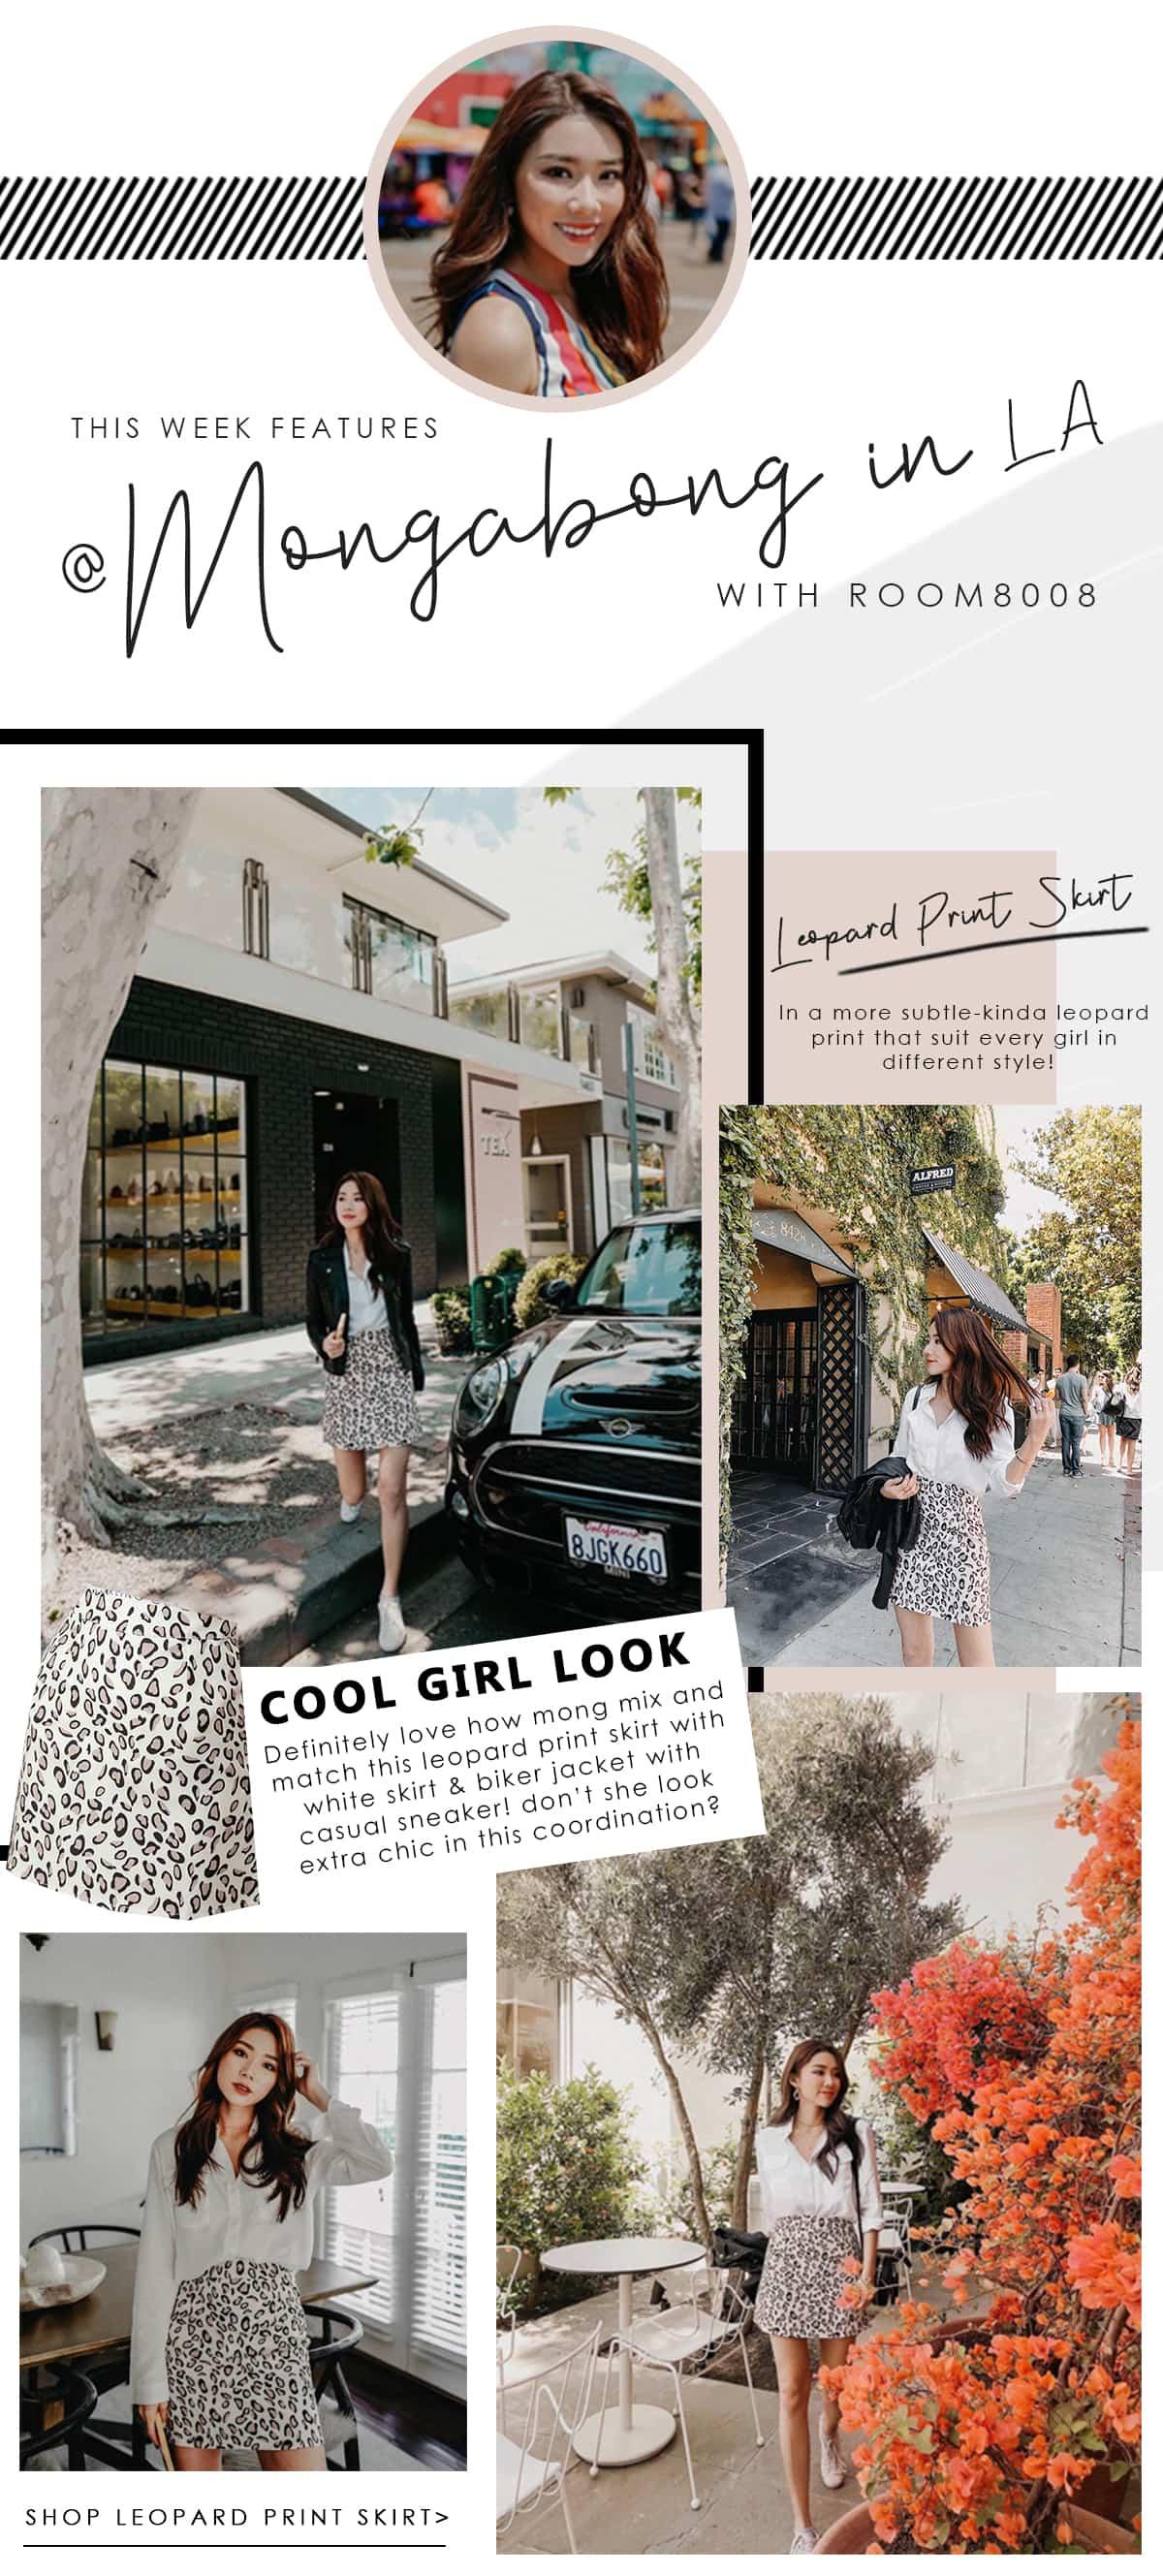 Fashion Edit Featuring Mongabong in LA 1